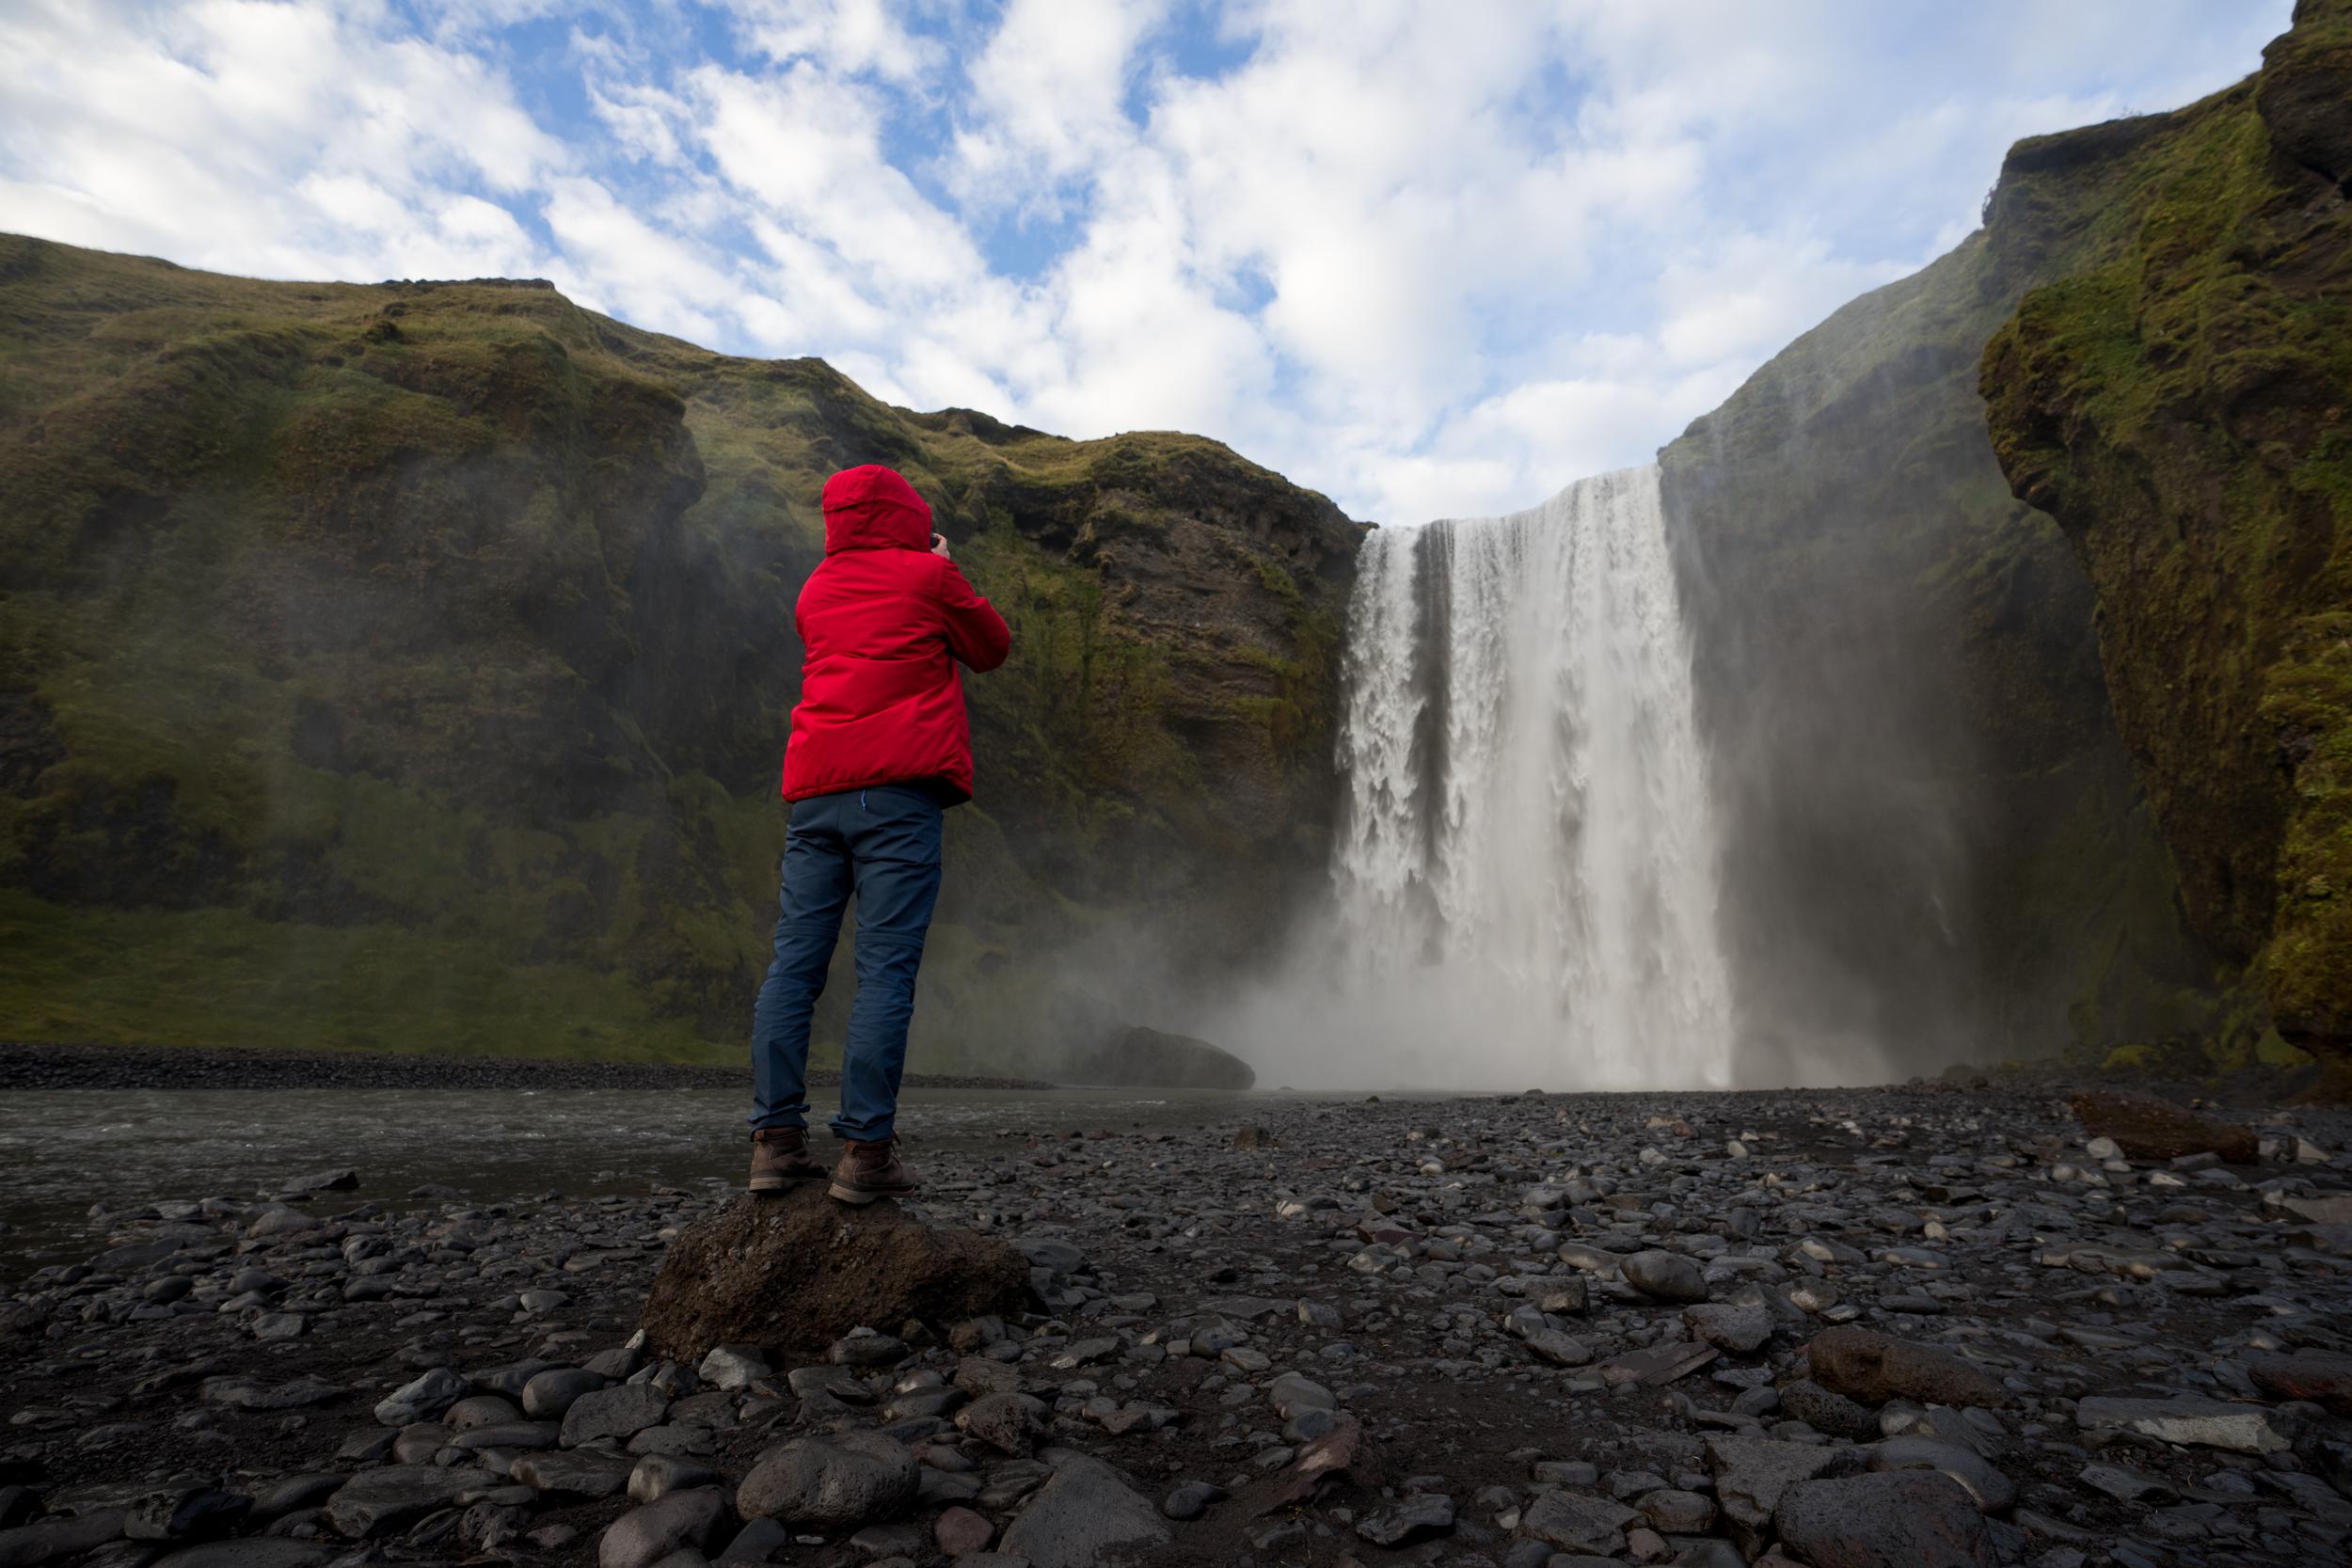 Iceland - 00540_ME - Chris Goetchius 2017 - WEB UPLOAD ONLY.jpg